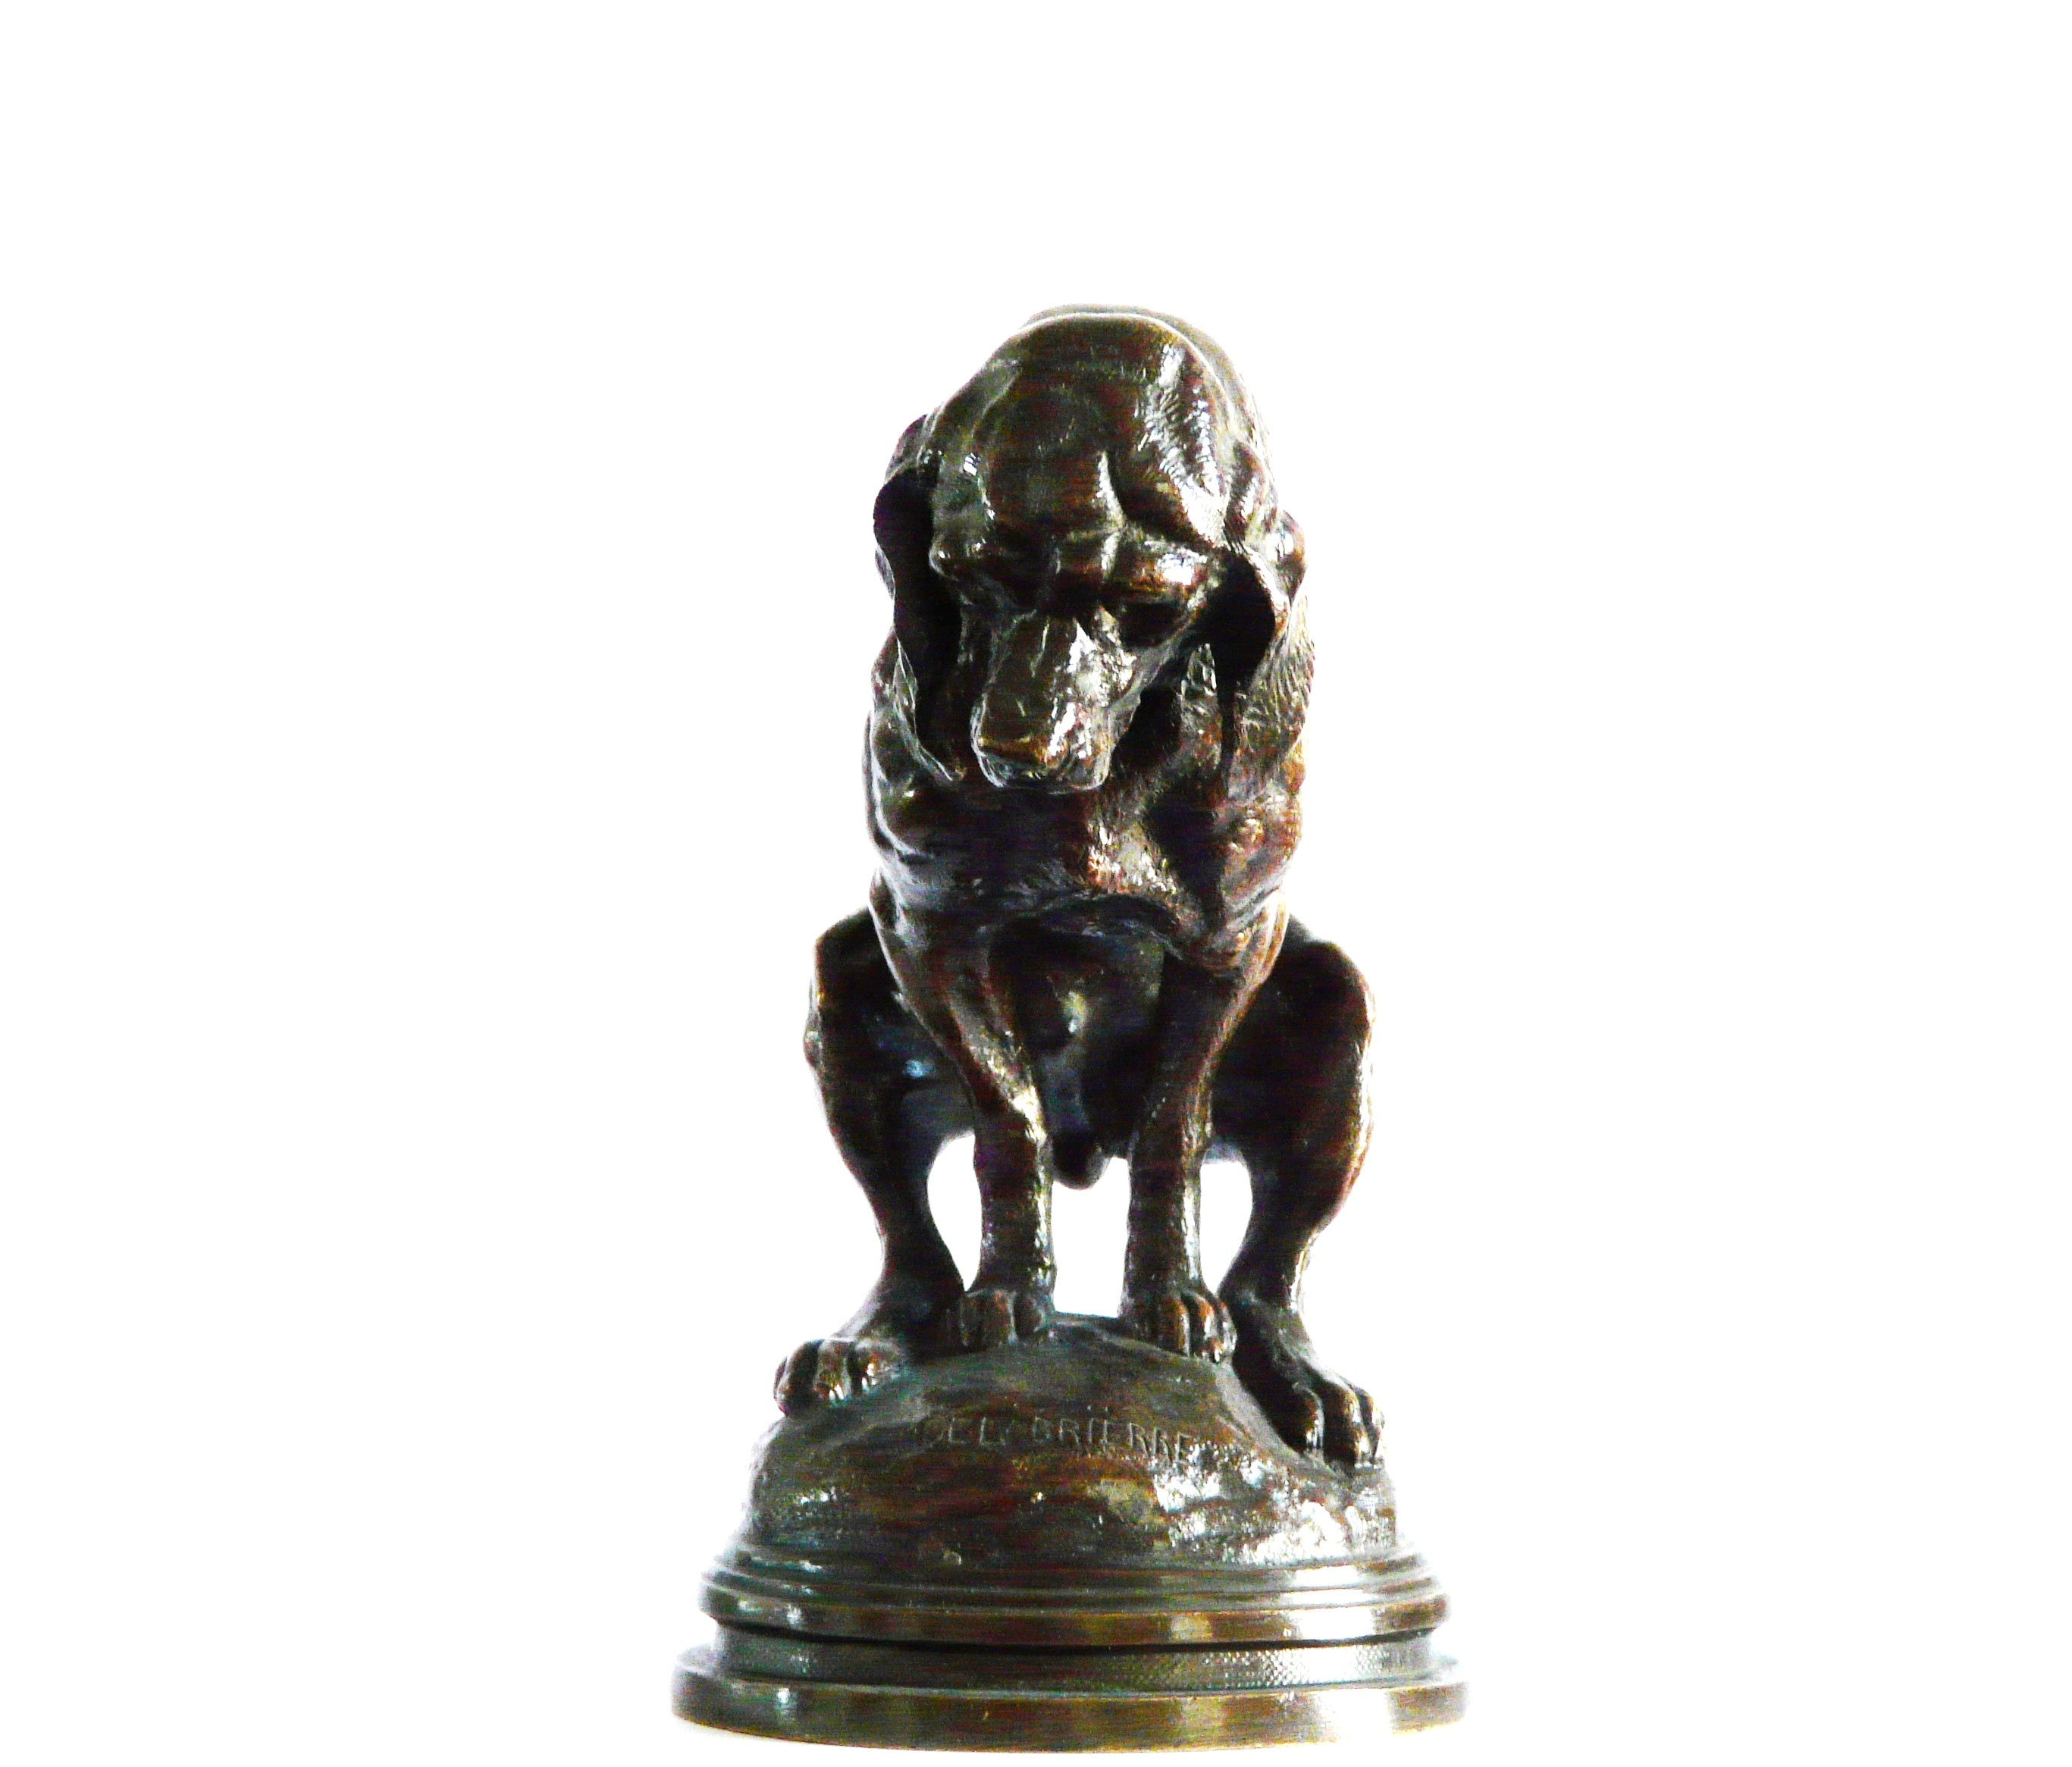 Bronze ancien Delabrierre Colcombet